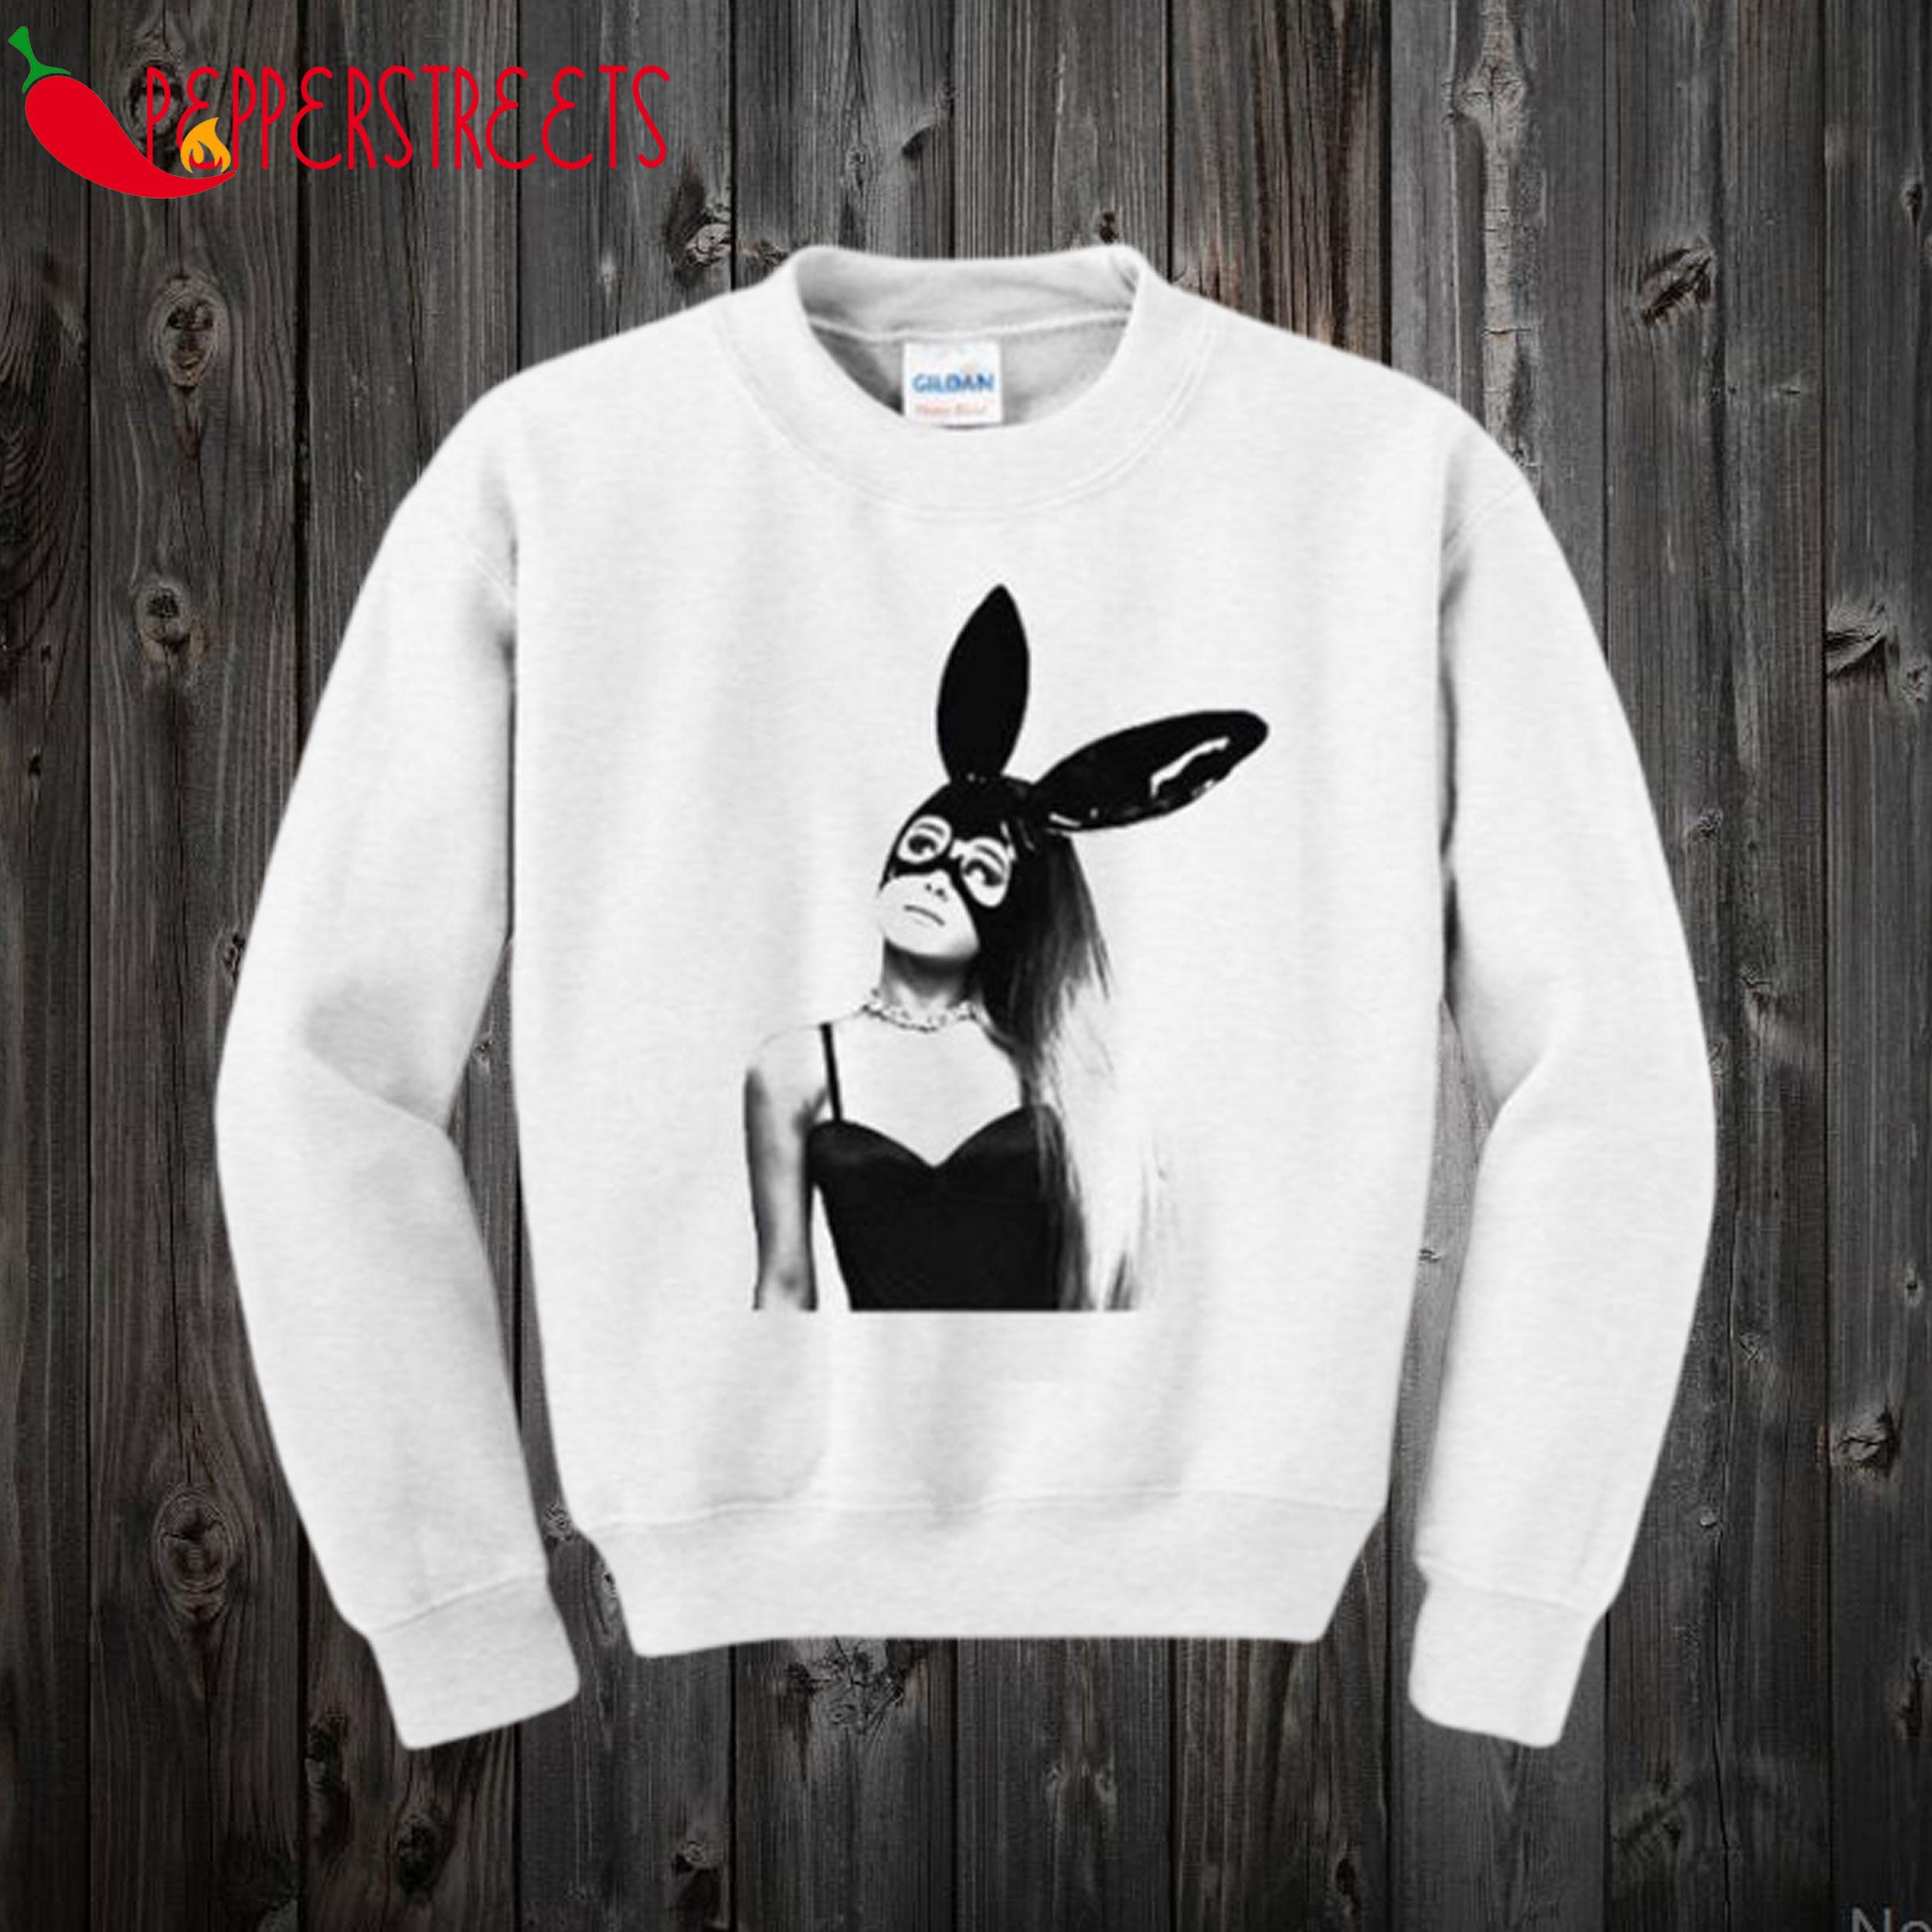 Ariana Grande Dangerous Woman Sweatshirt